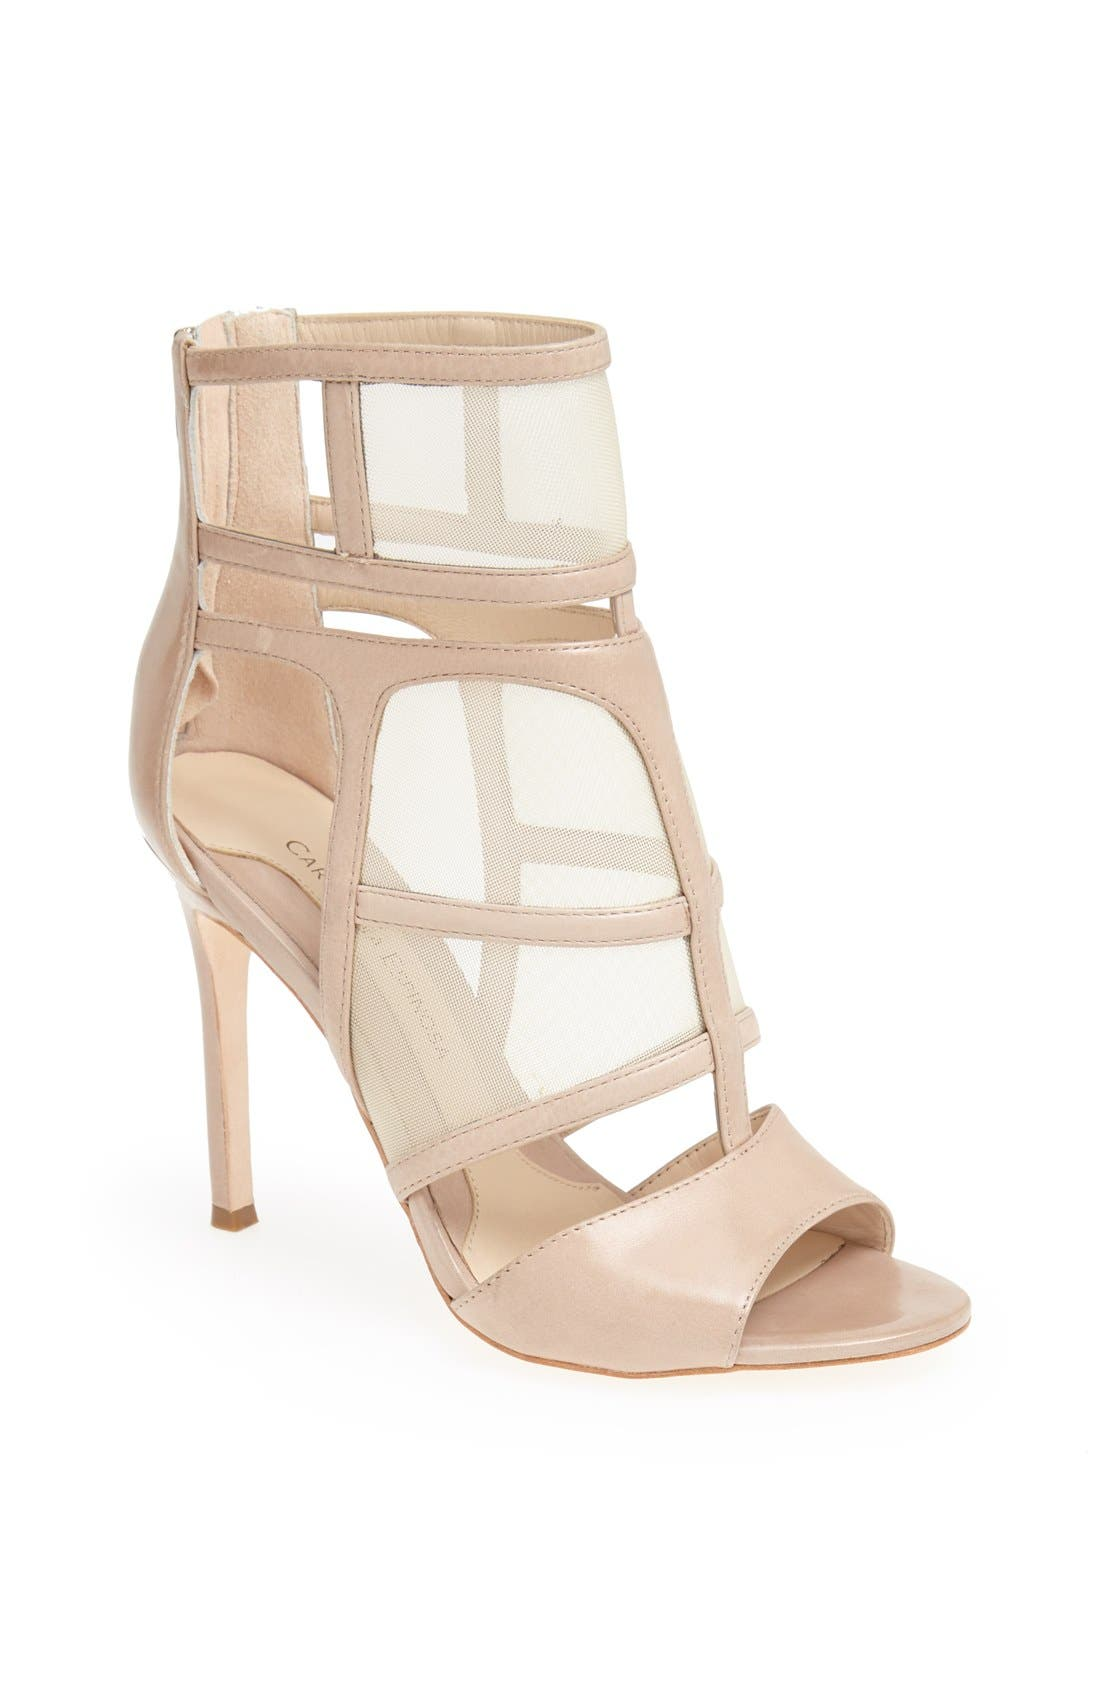 Main Image - Carolinna Espinosa 'Sammy' Leather Sandal